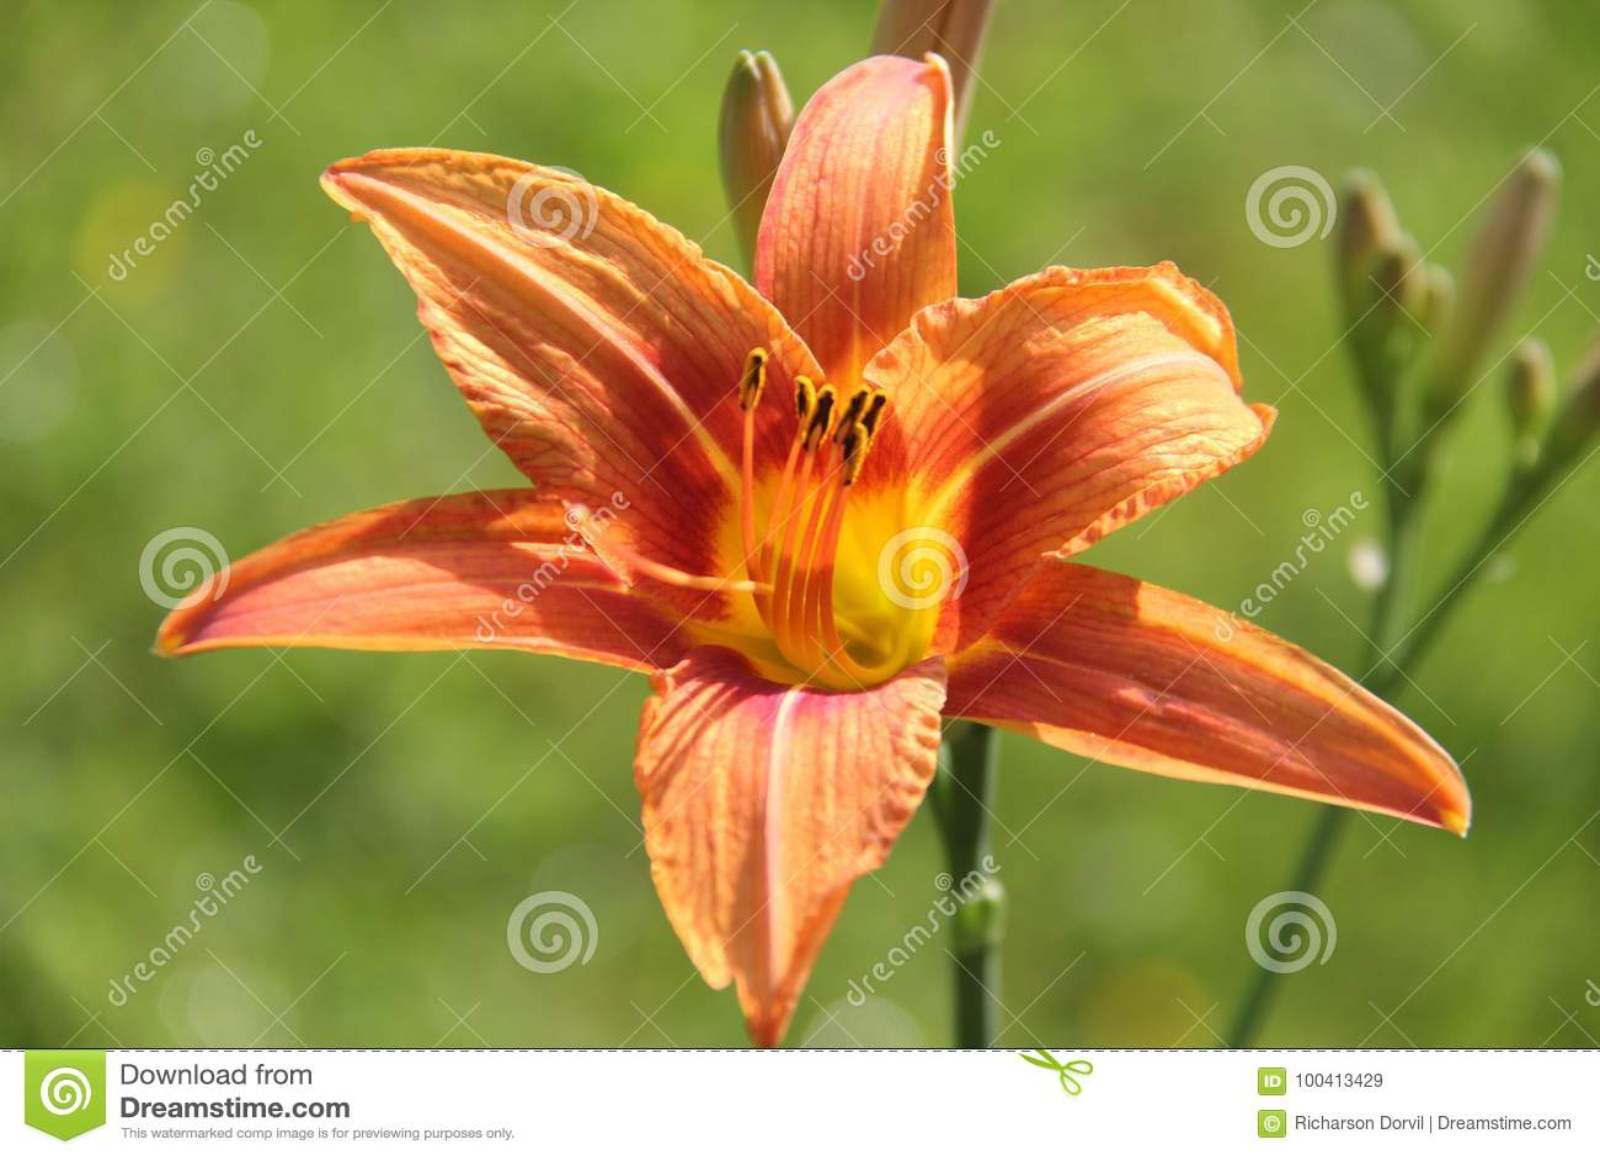 Orange Daylili Stock Image Image Of Jardin Richarsondorvildorvil